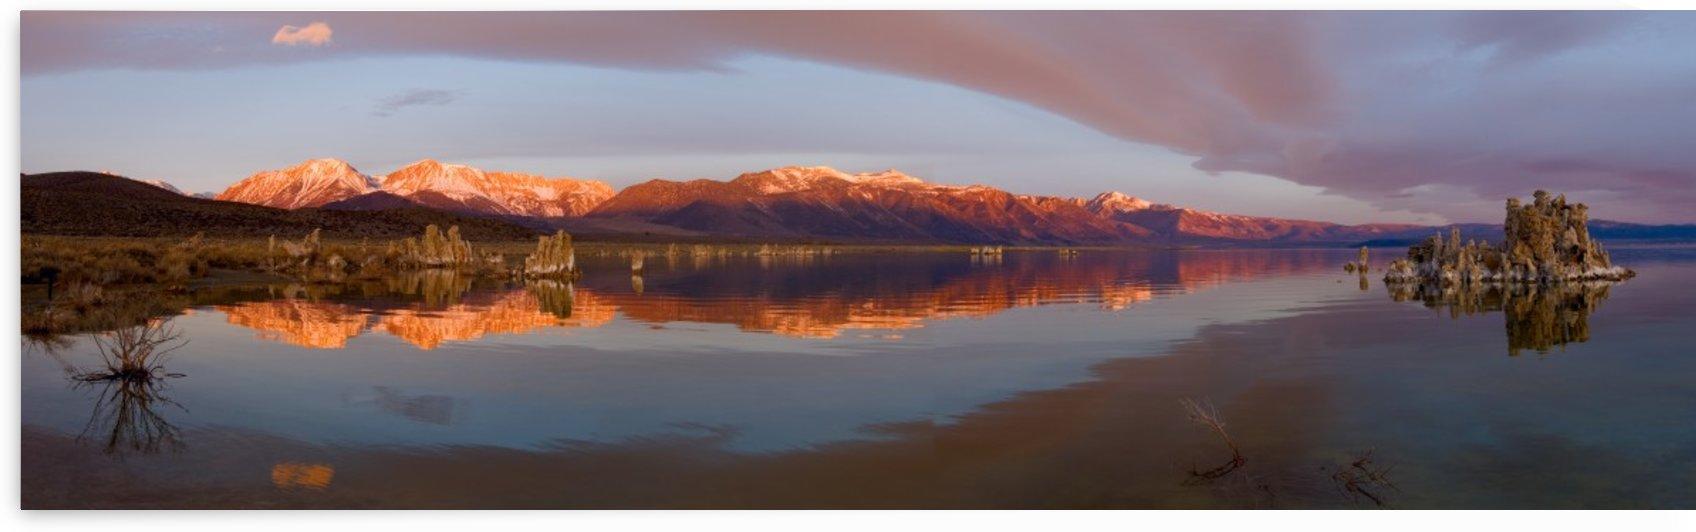 Mono Lake Panorama by 1x